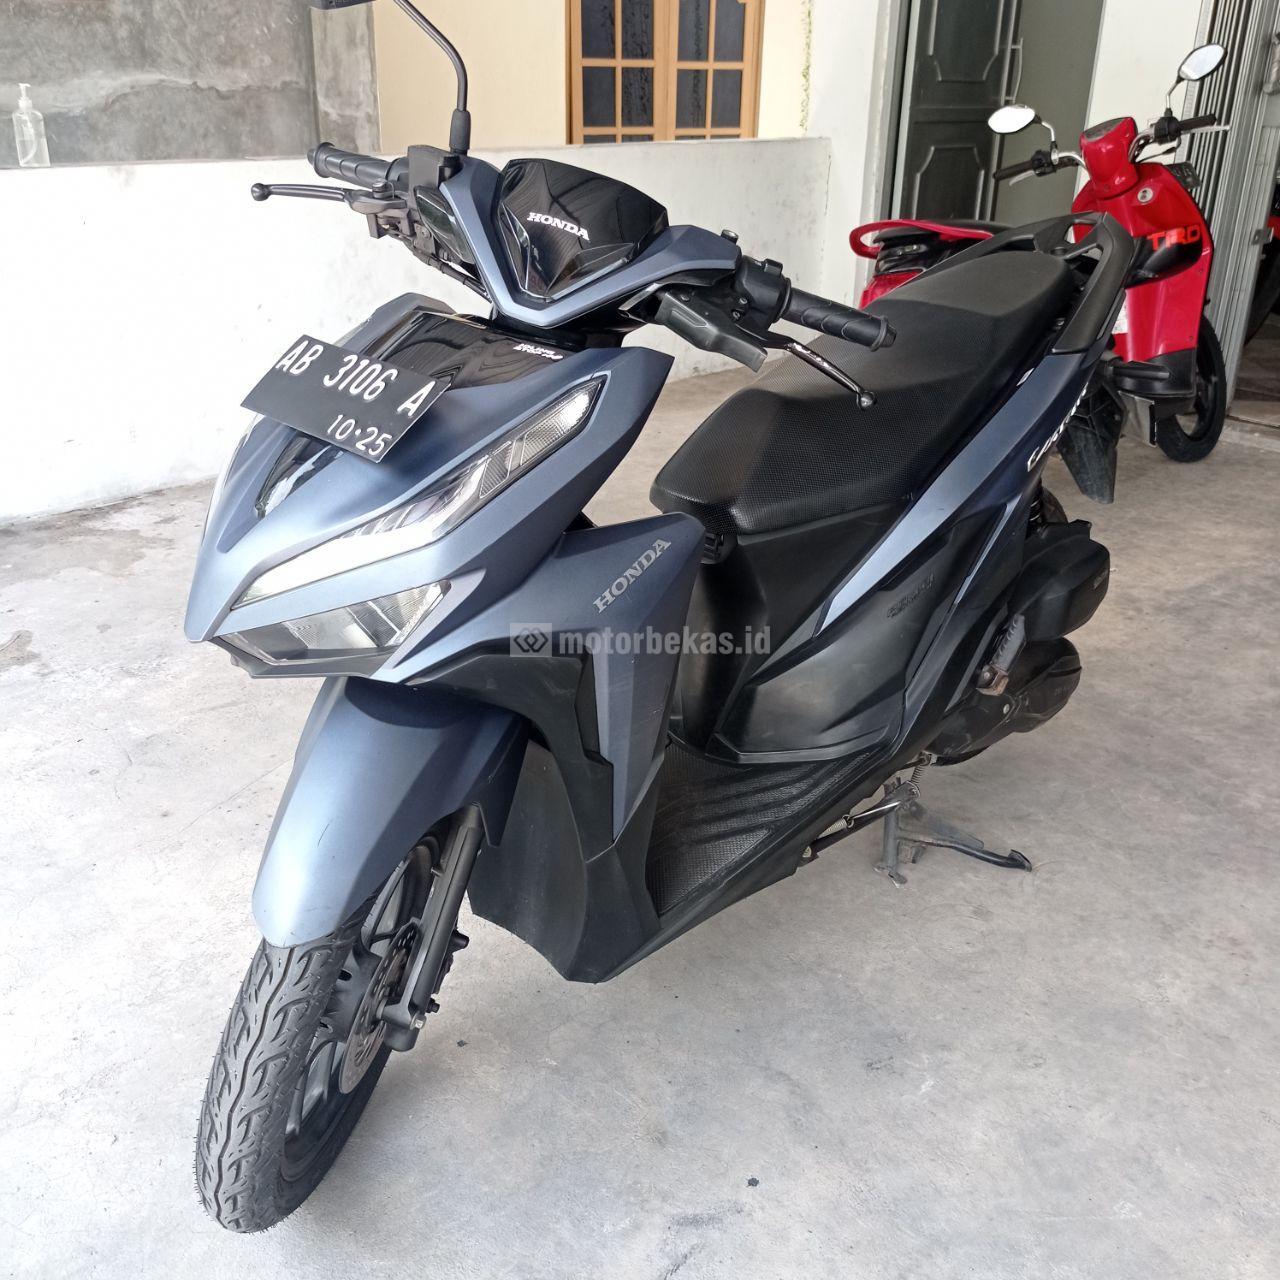 HONDA VARIO 125  2020 motorbekas.id